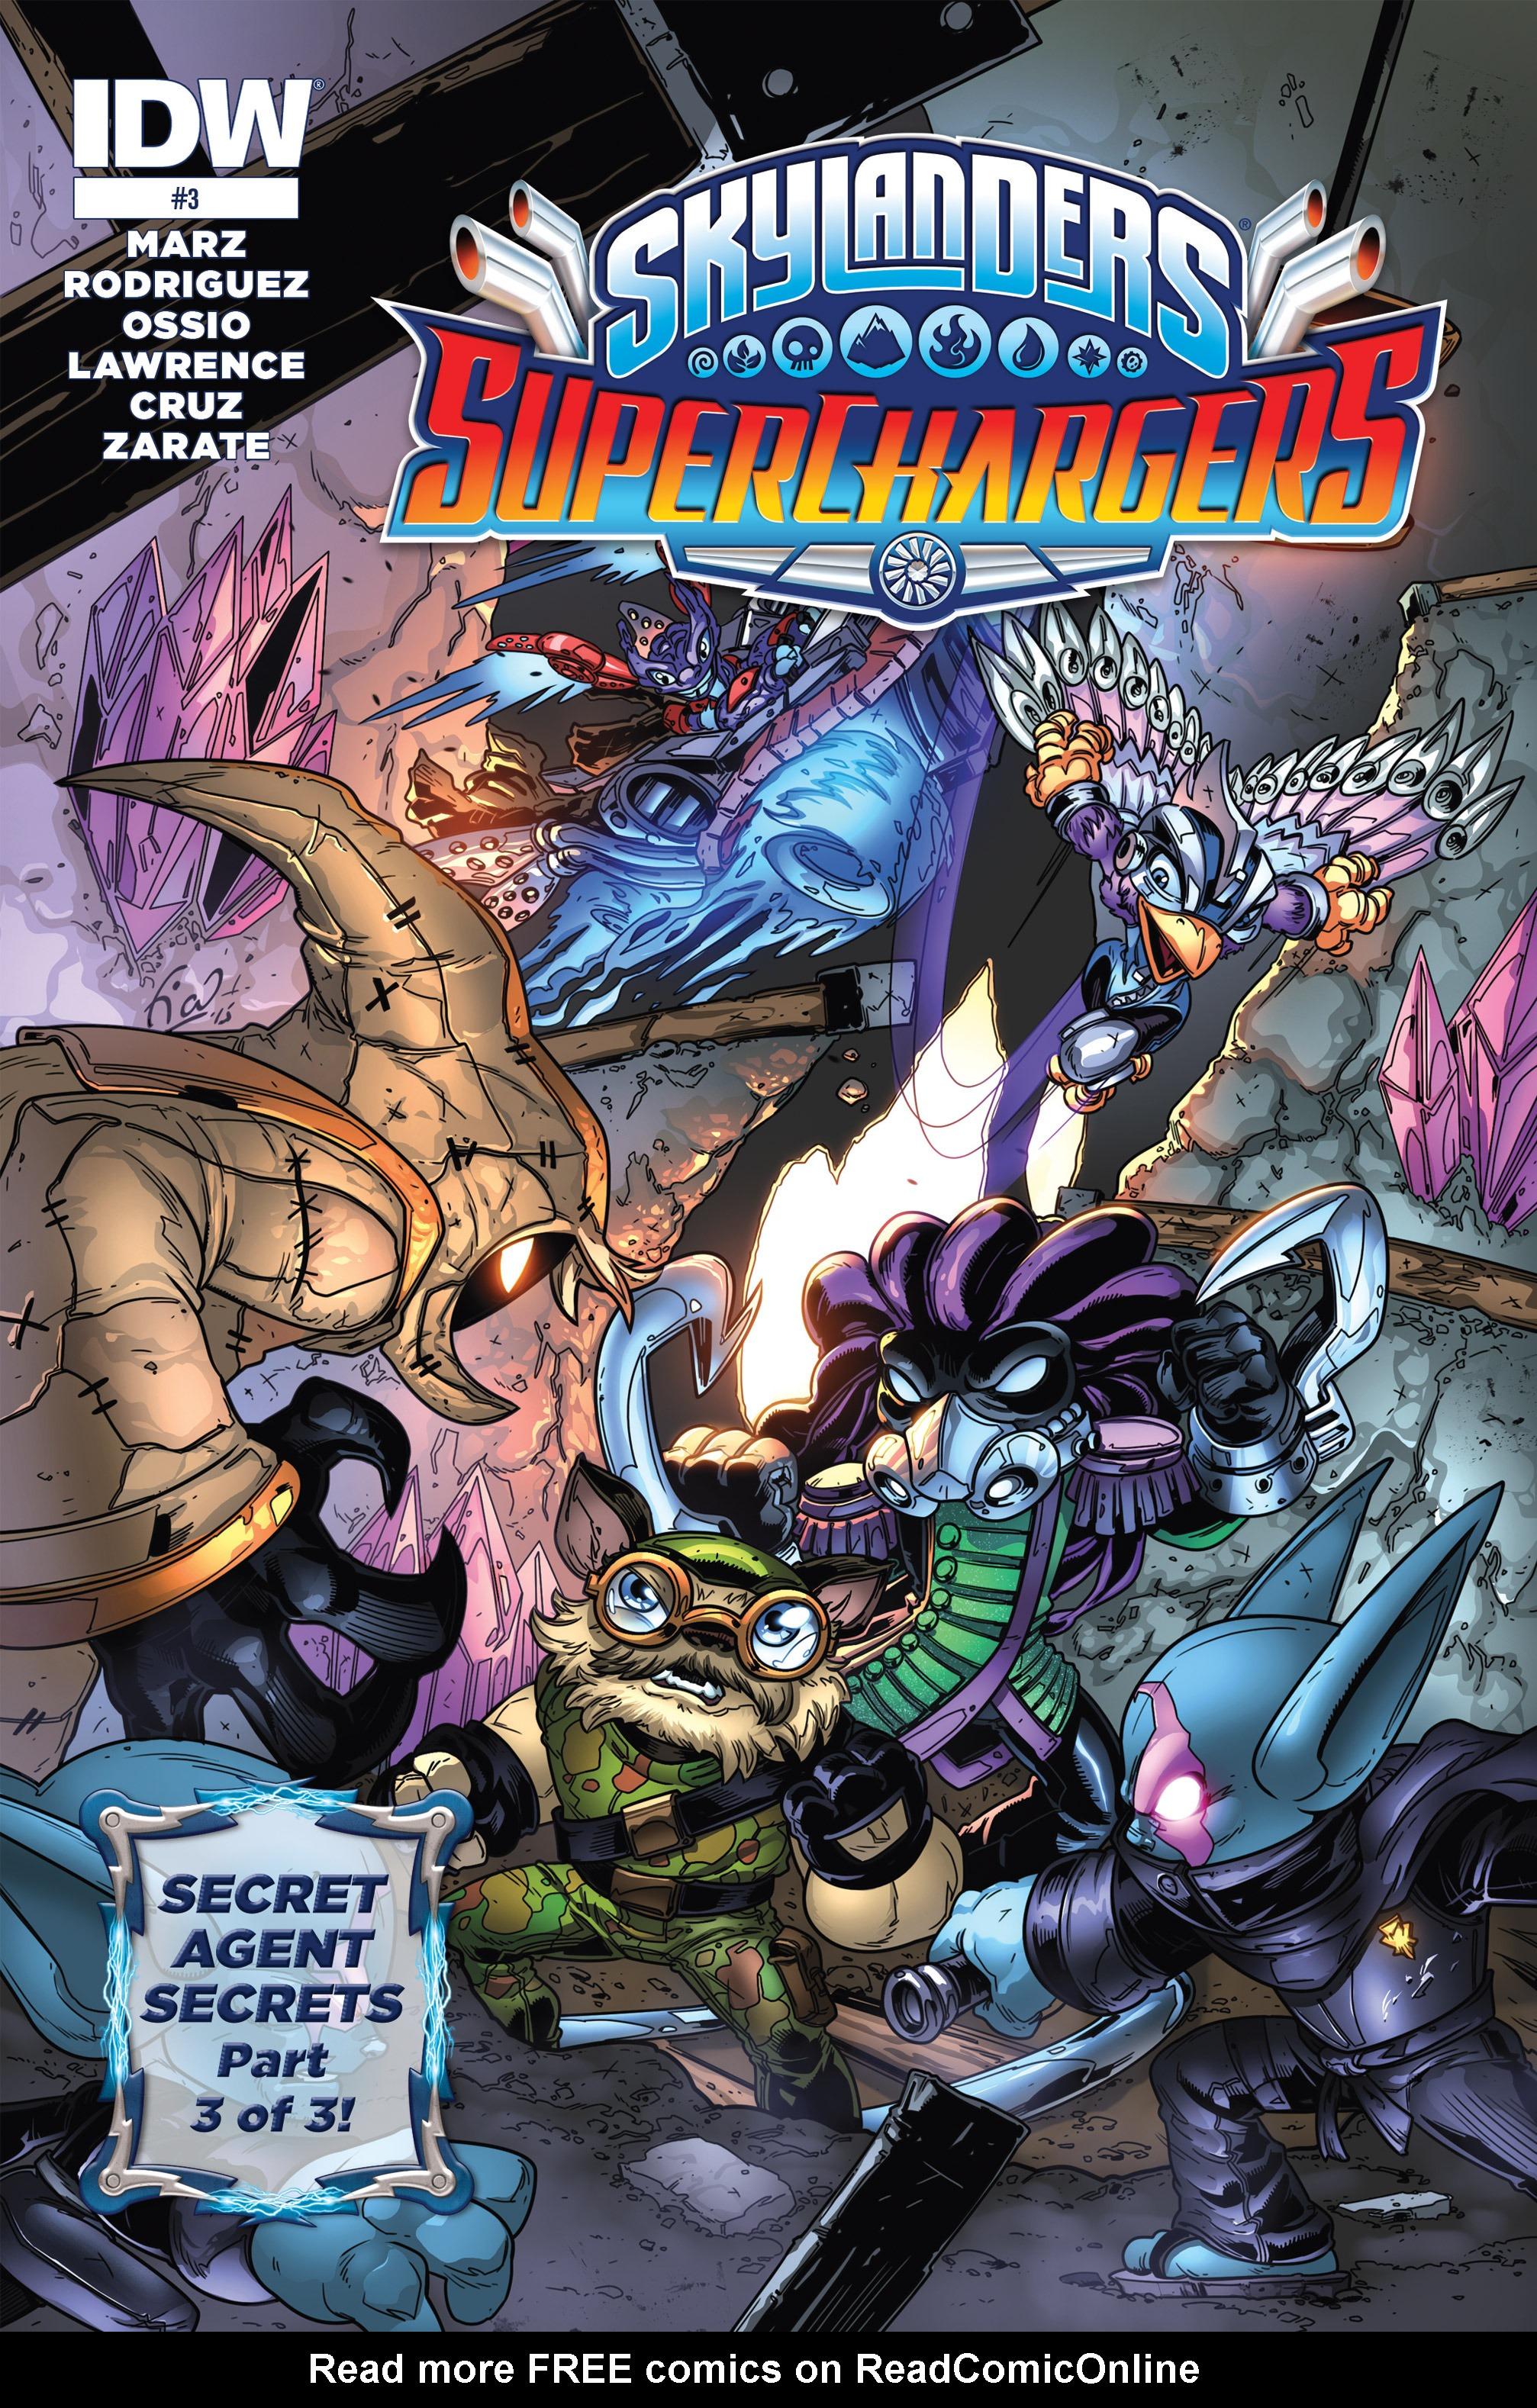 Read online Skylanders Superchargers comic -  Issue #3 - 1